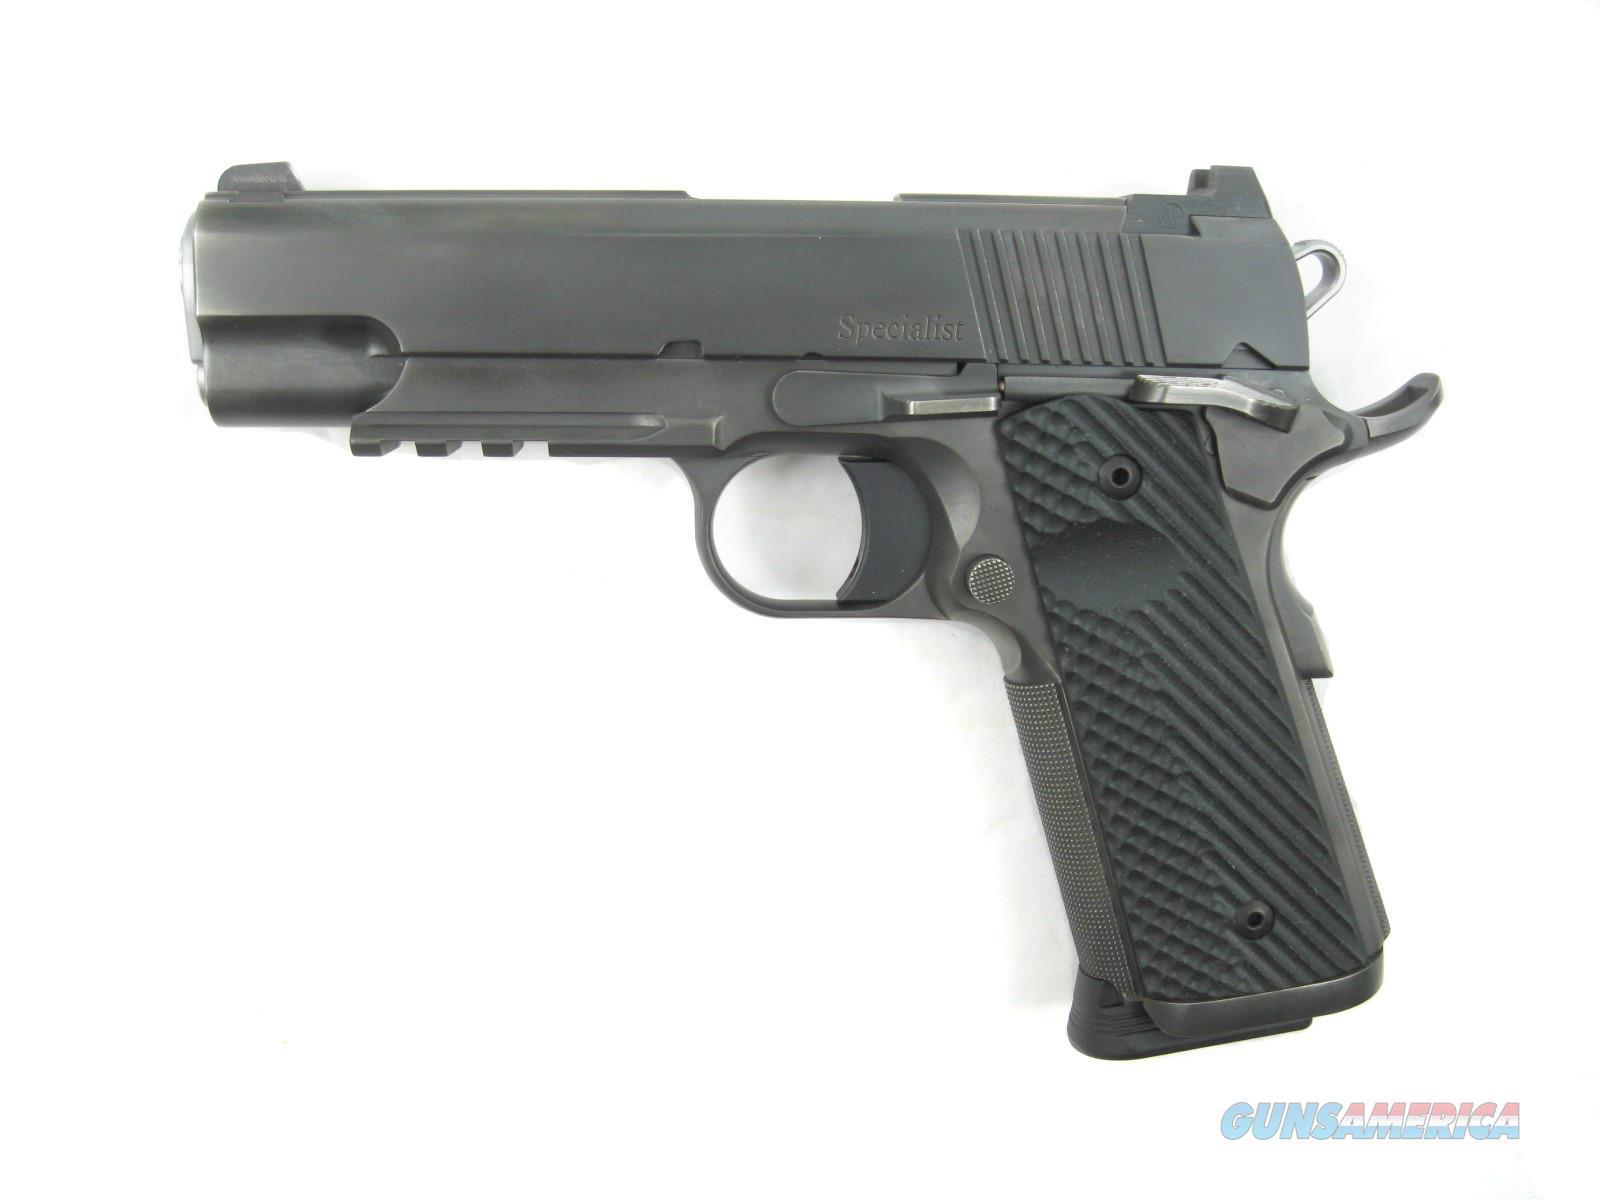 Dan Wesson Specialist Distressed Commander .45 acp Night Sights 01897 *NEW*  Guns > Pistols > Dan Wesson Pistols/Revolvers > 1911 Style